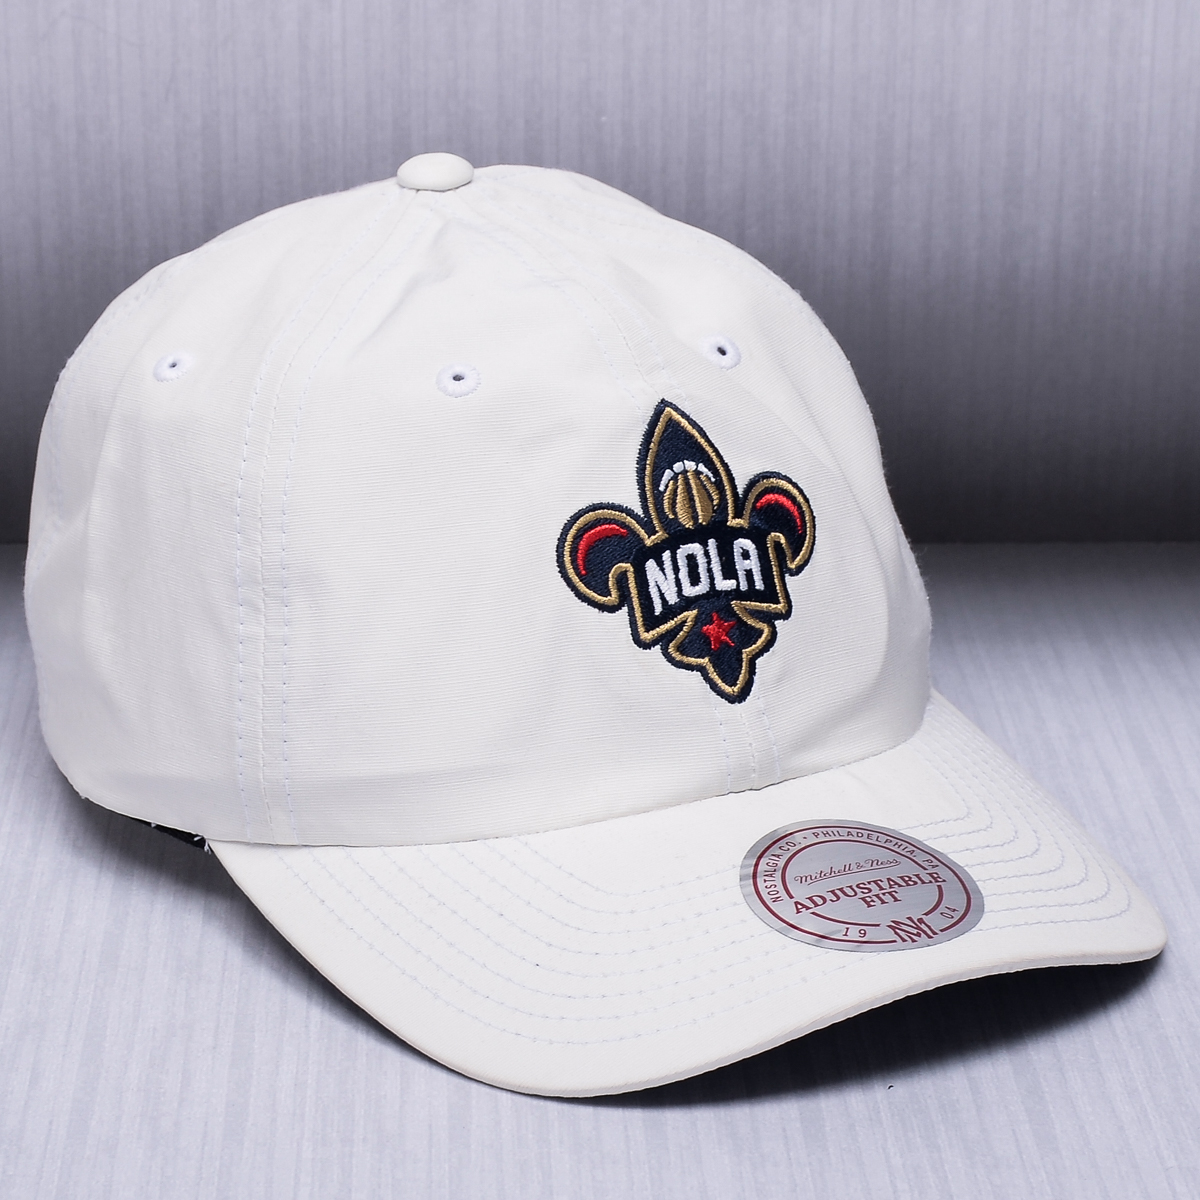 Mitchell   Ness NBA All-Star Peached Oxford Dad Cap - NBA Shop Others NBA  Clubs Merchandise - Superfanas.lt 2766d0e40aa0